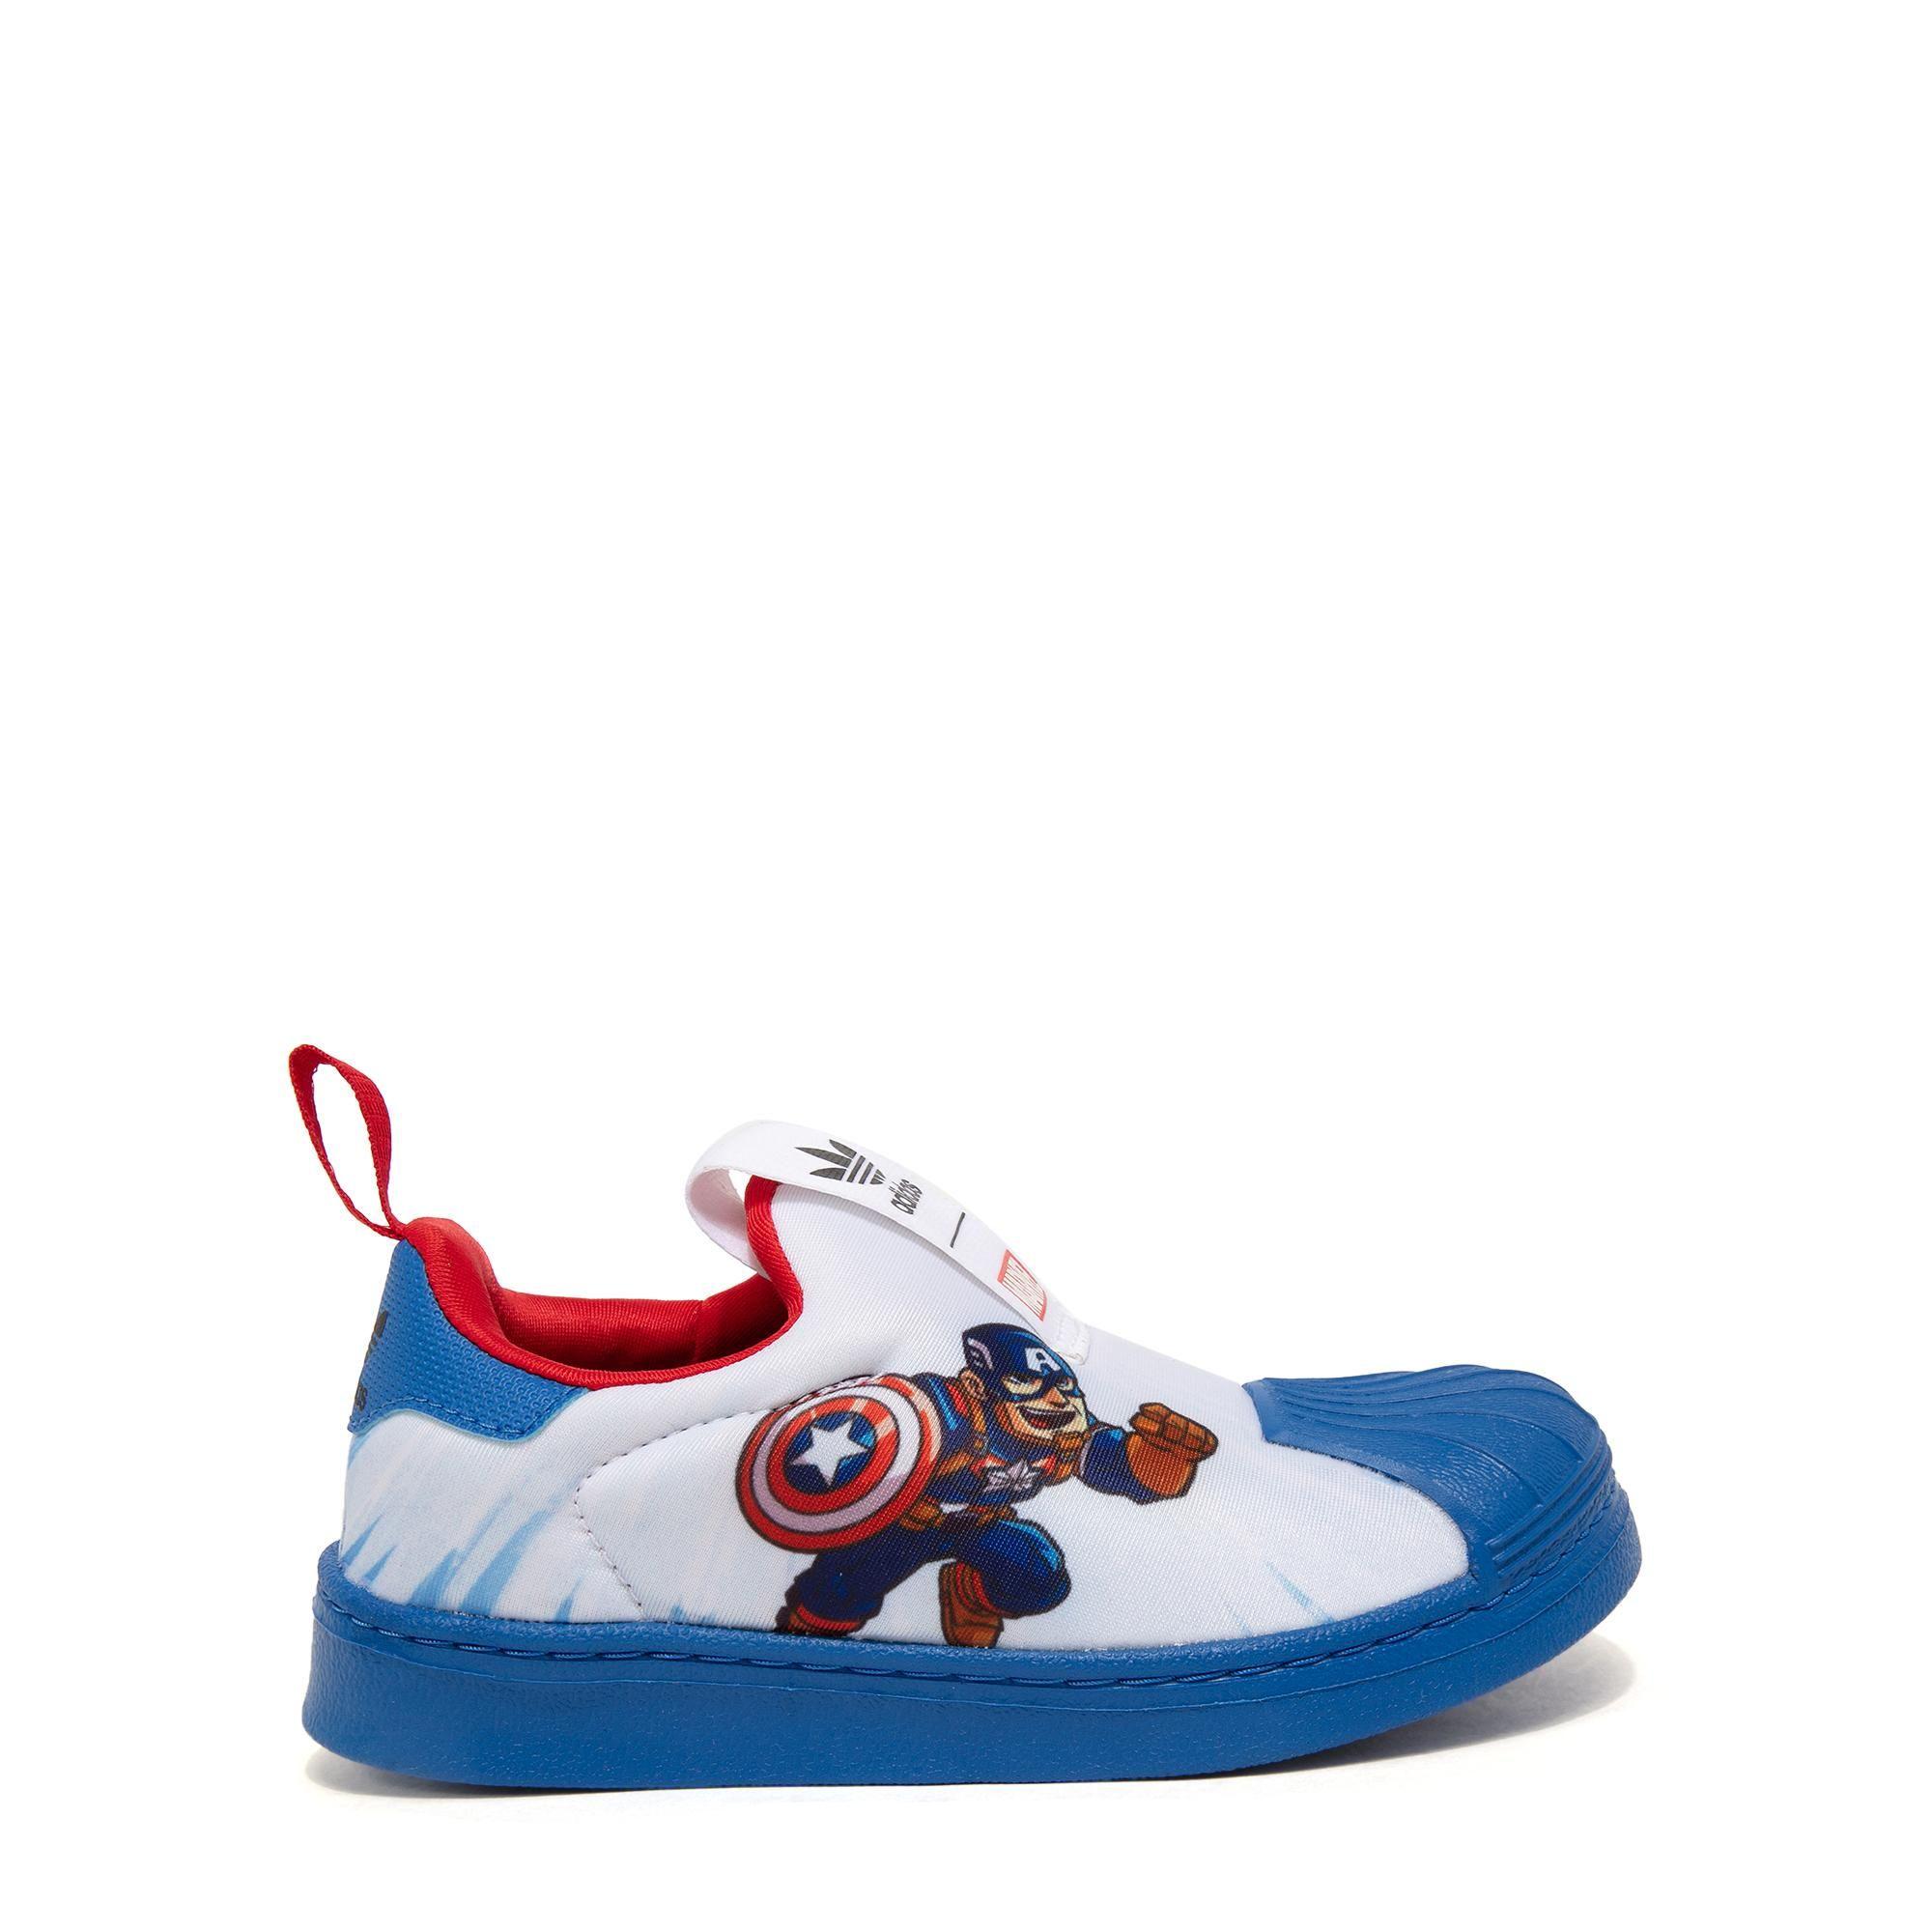 Superstar 360 Marvel sneakers